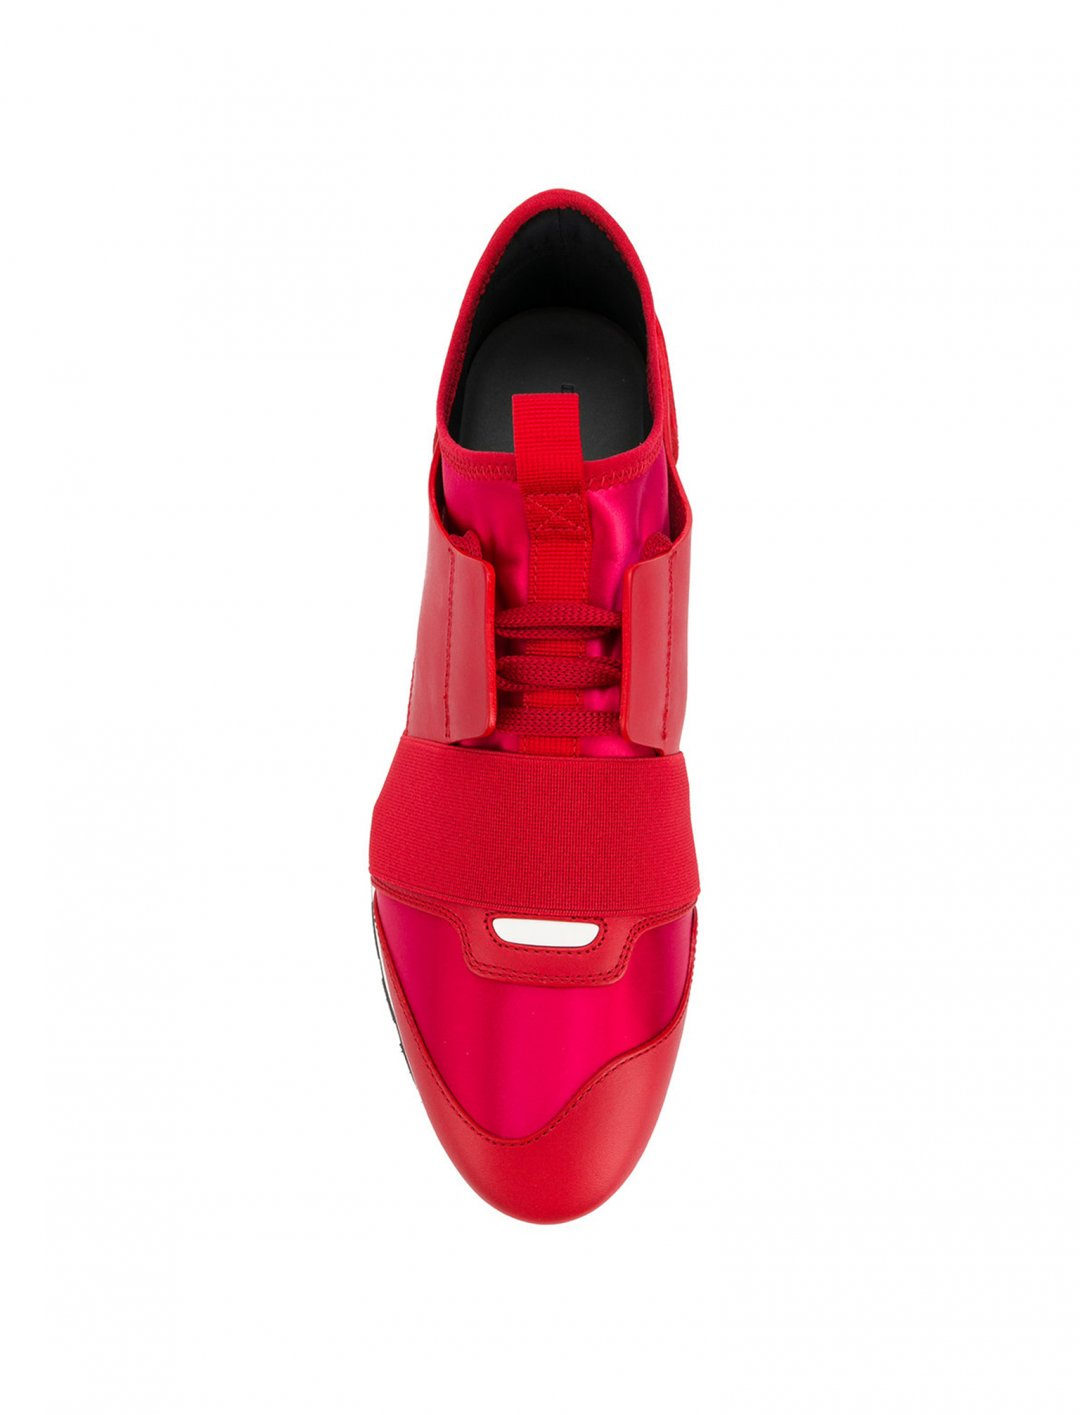 "Balenciaga Red Race Runners {""id"":5,""product_section_id"":1,""name"":""Clothing"",""order"":5} Balenciaga"